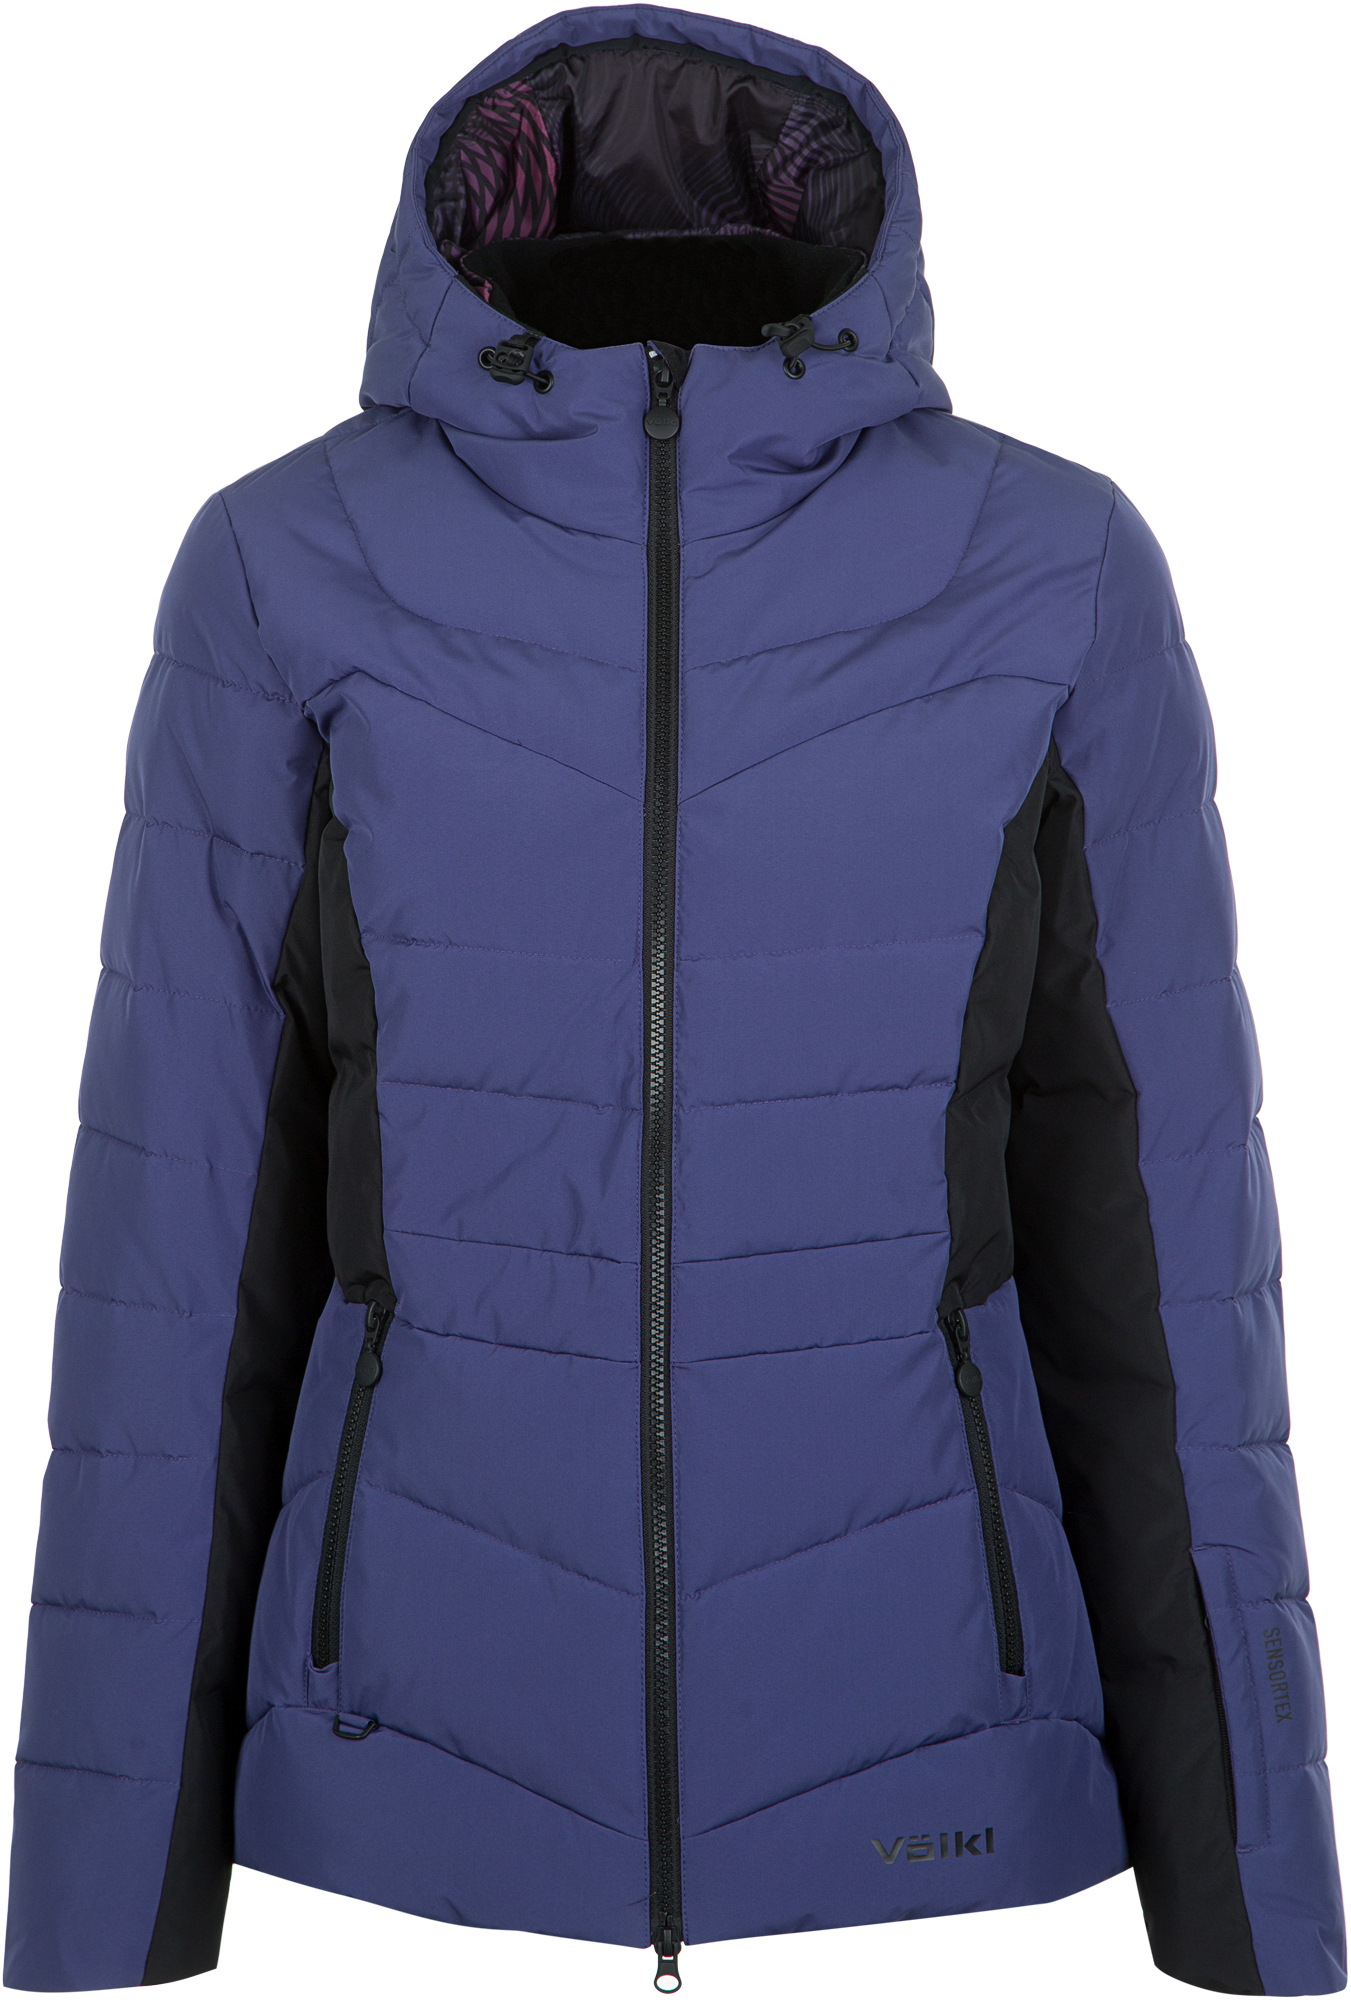 Volkl Куртка утепленная женская Volkl, размер 44 volkl volkl flair sc vmotion 11 alu gw lady 18 19 размер 158